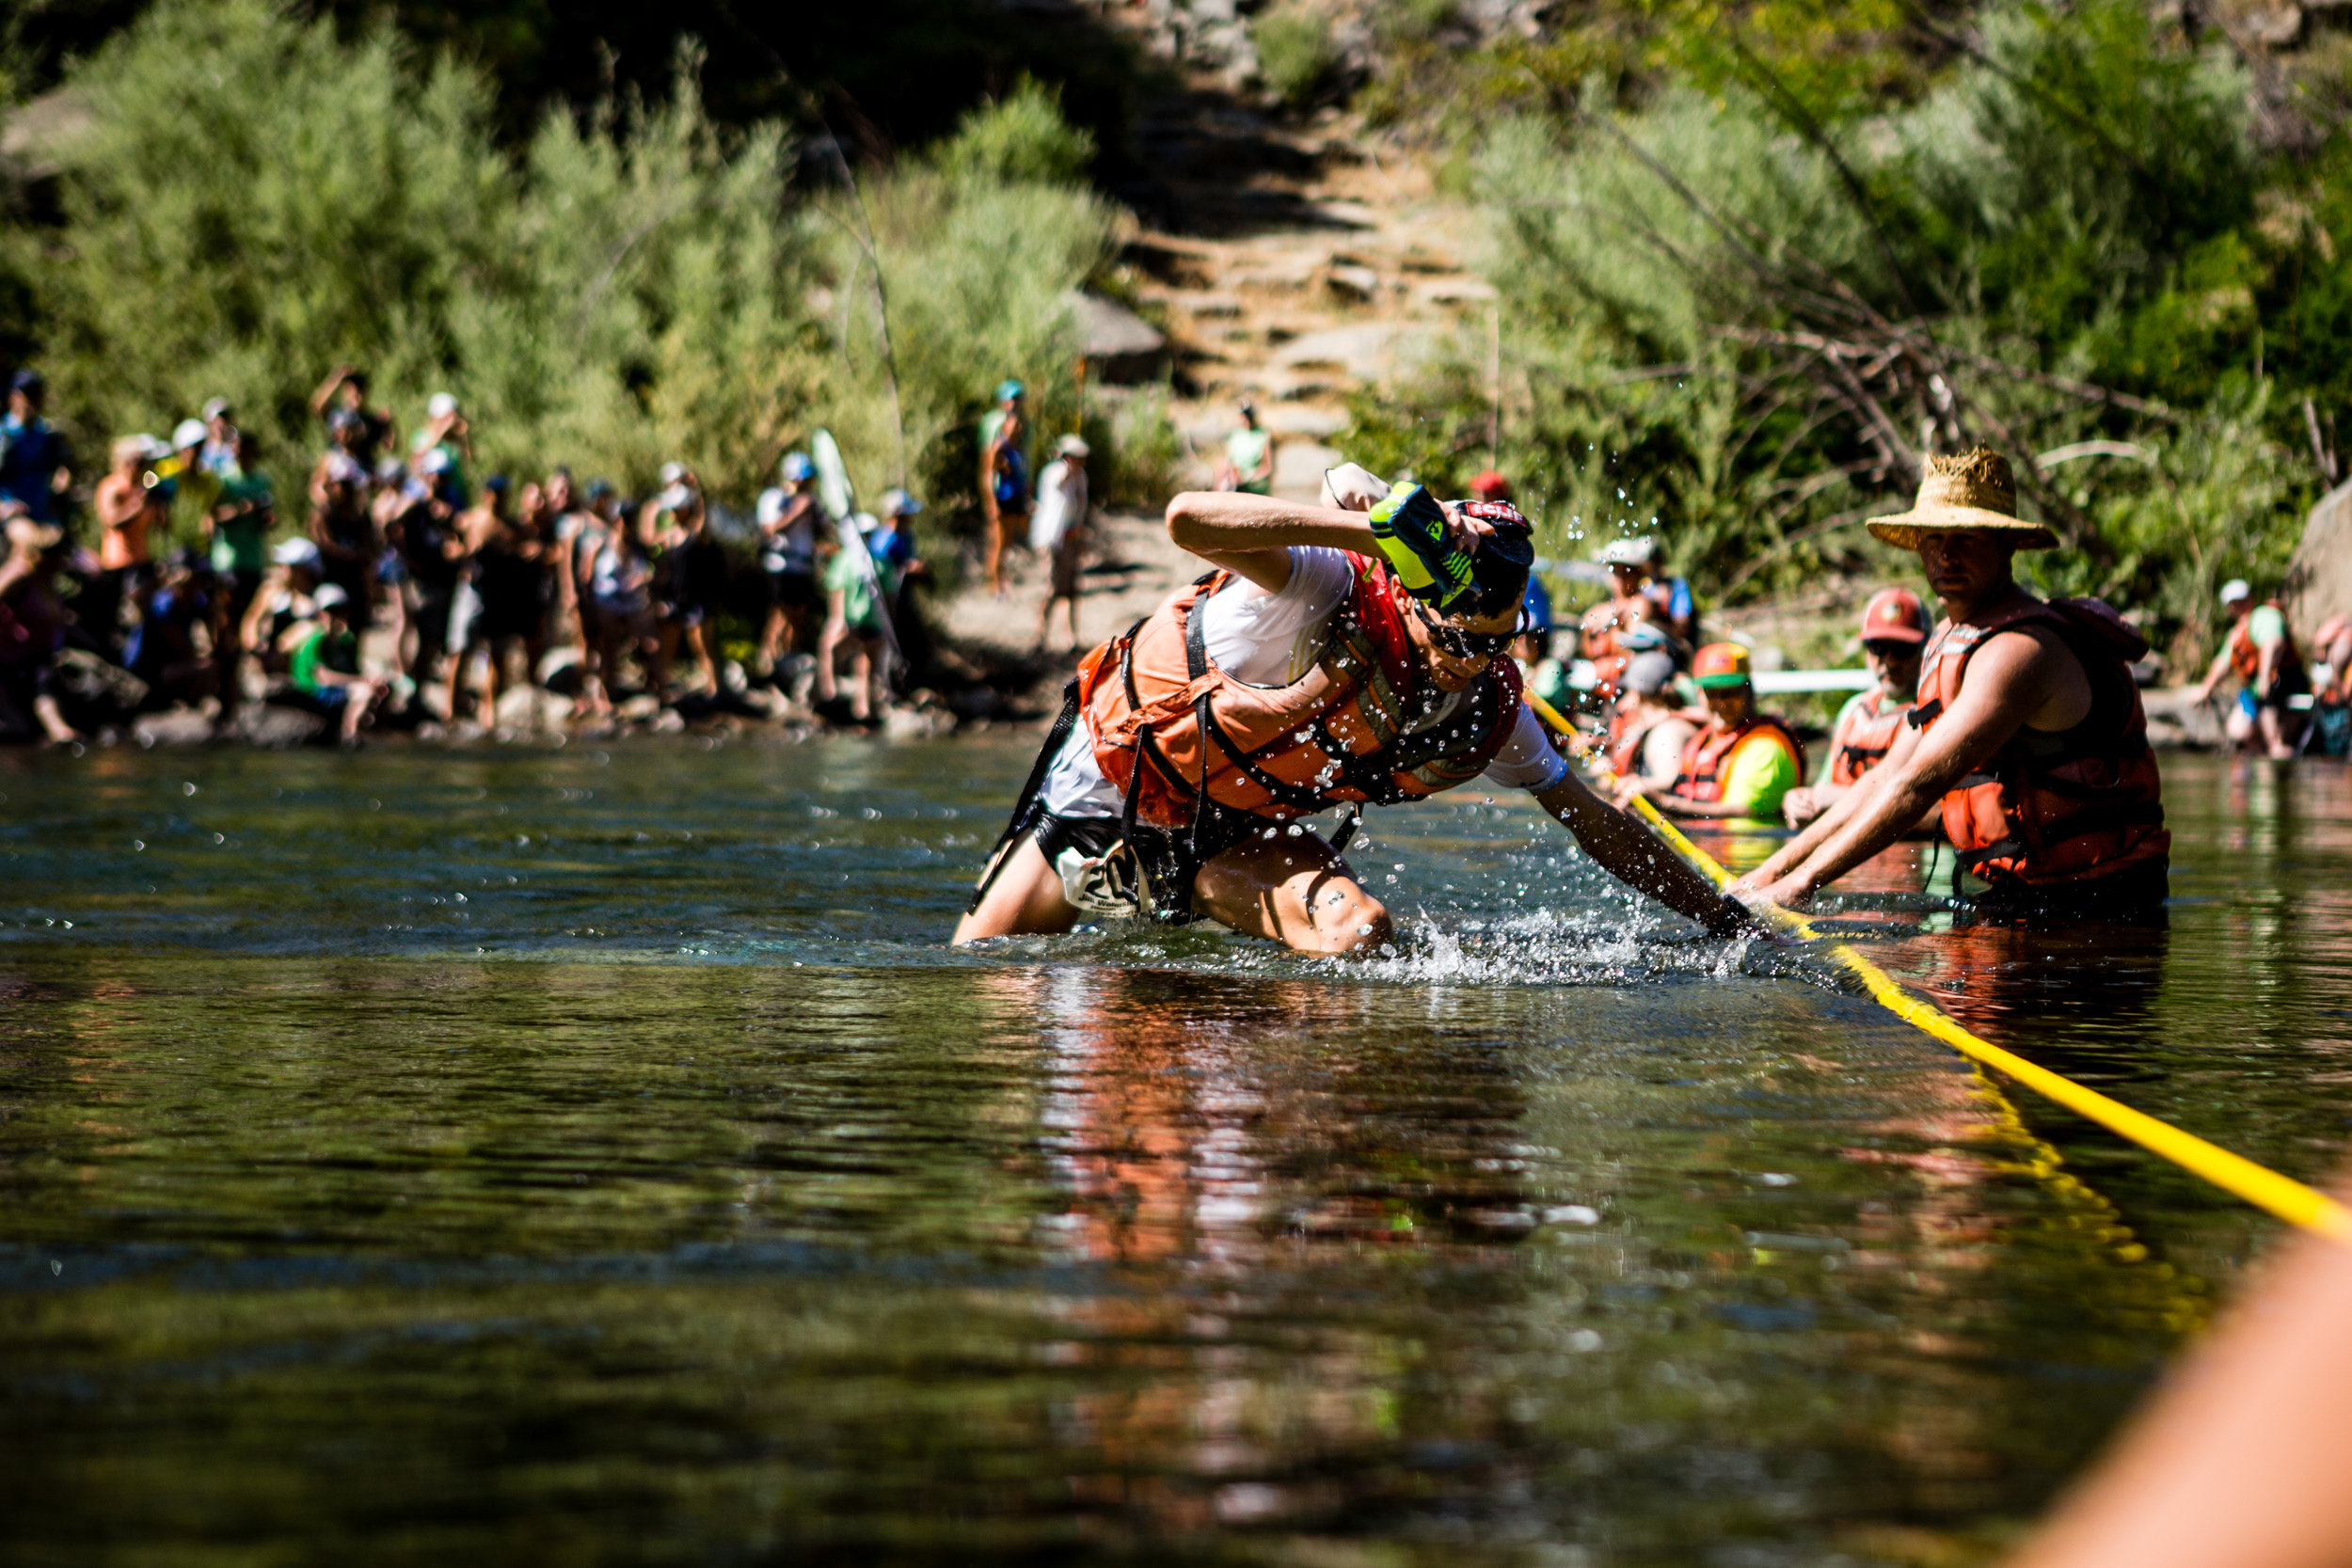 Jim Walmsley_Western States_River Crossing_Ryland West.jpg